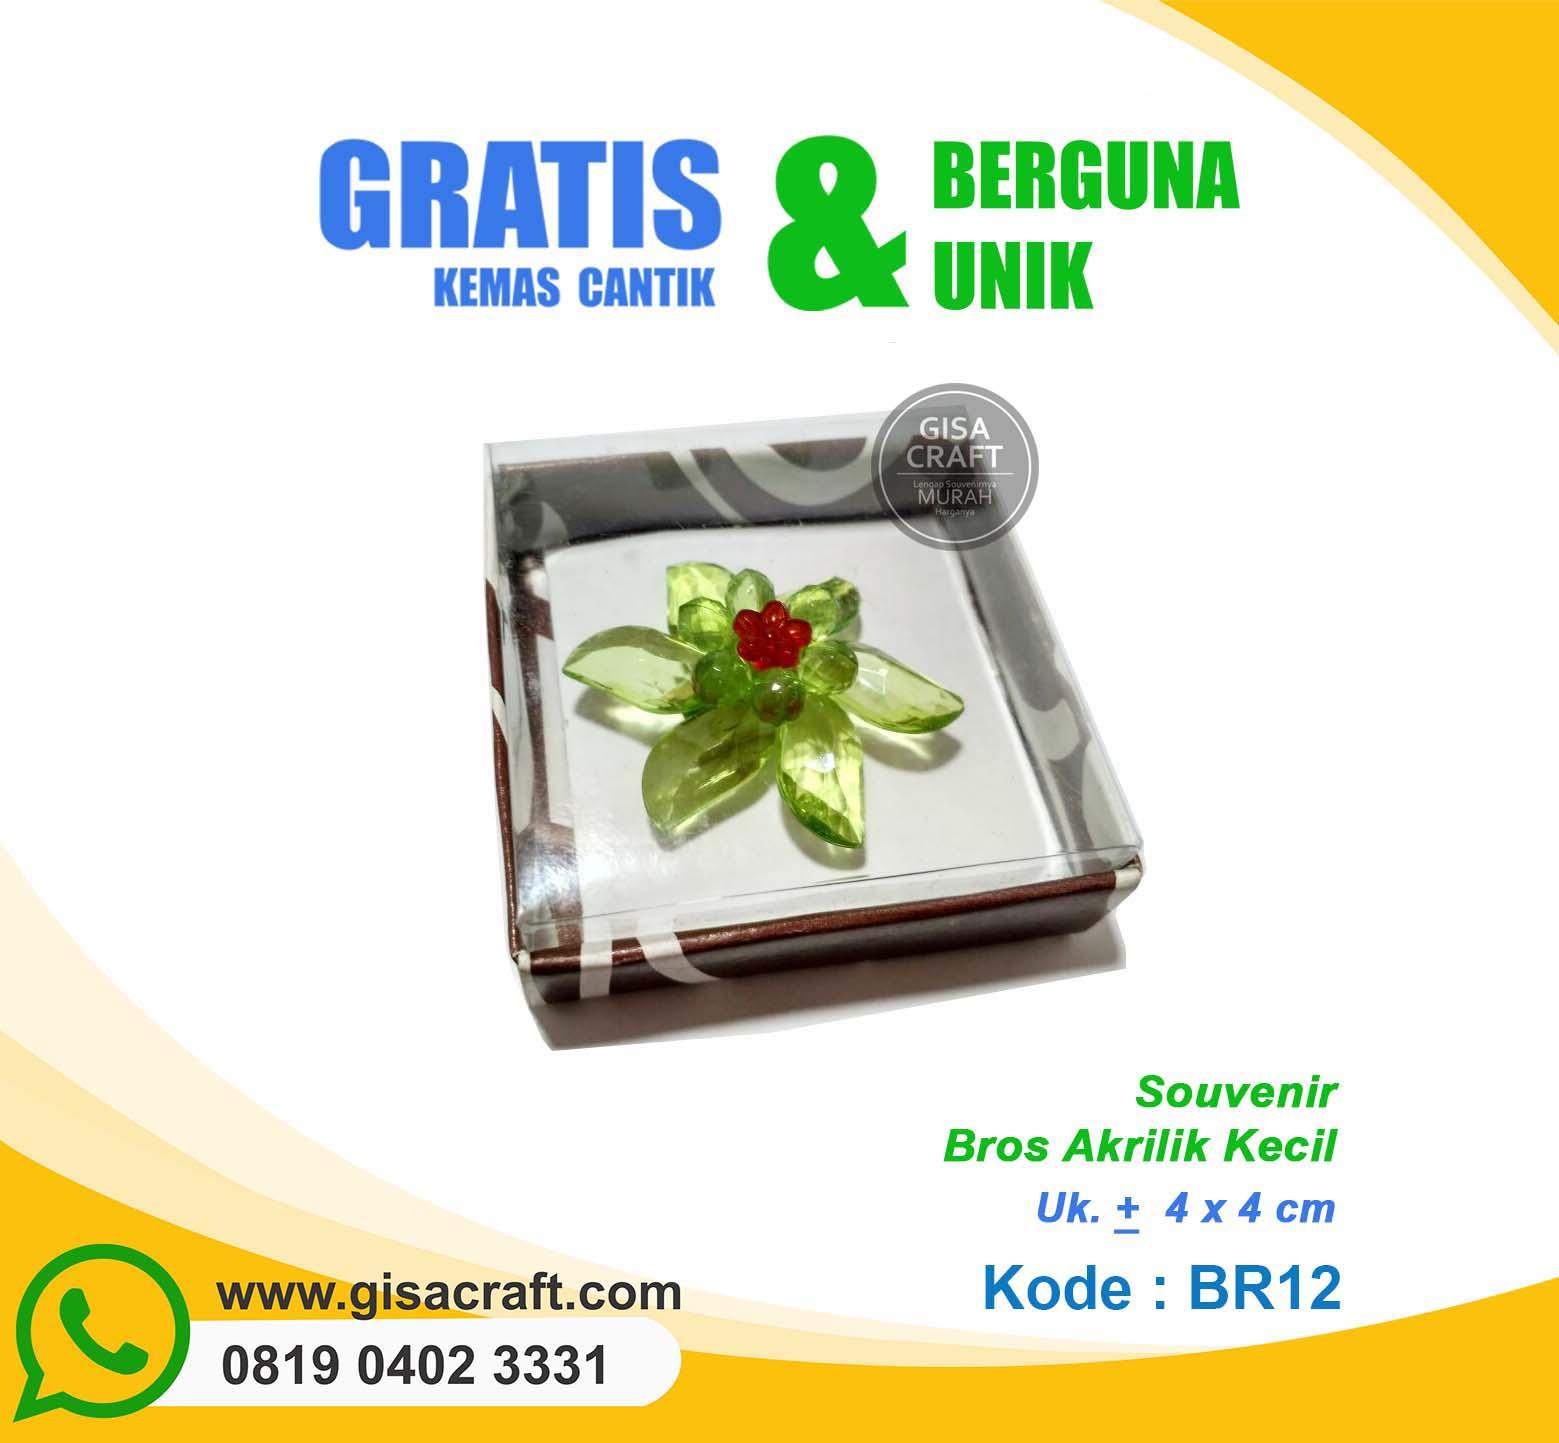 Souvenir Bros Akrilik Kecil BR12